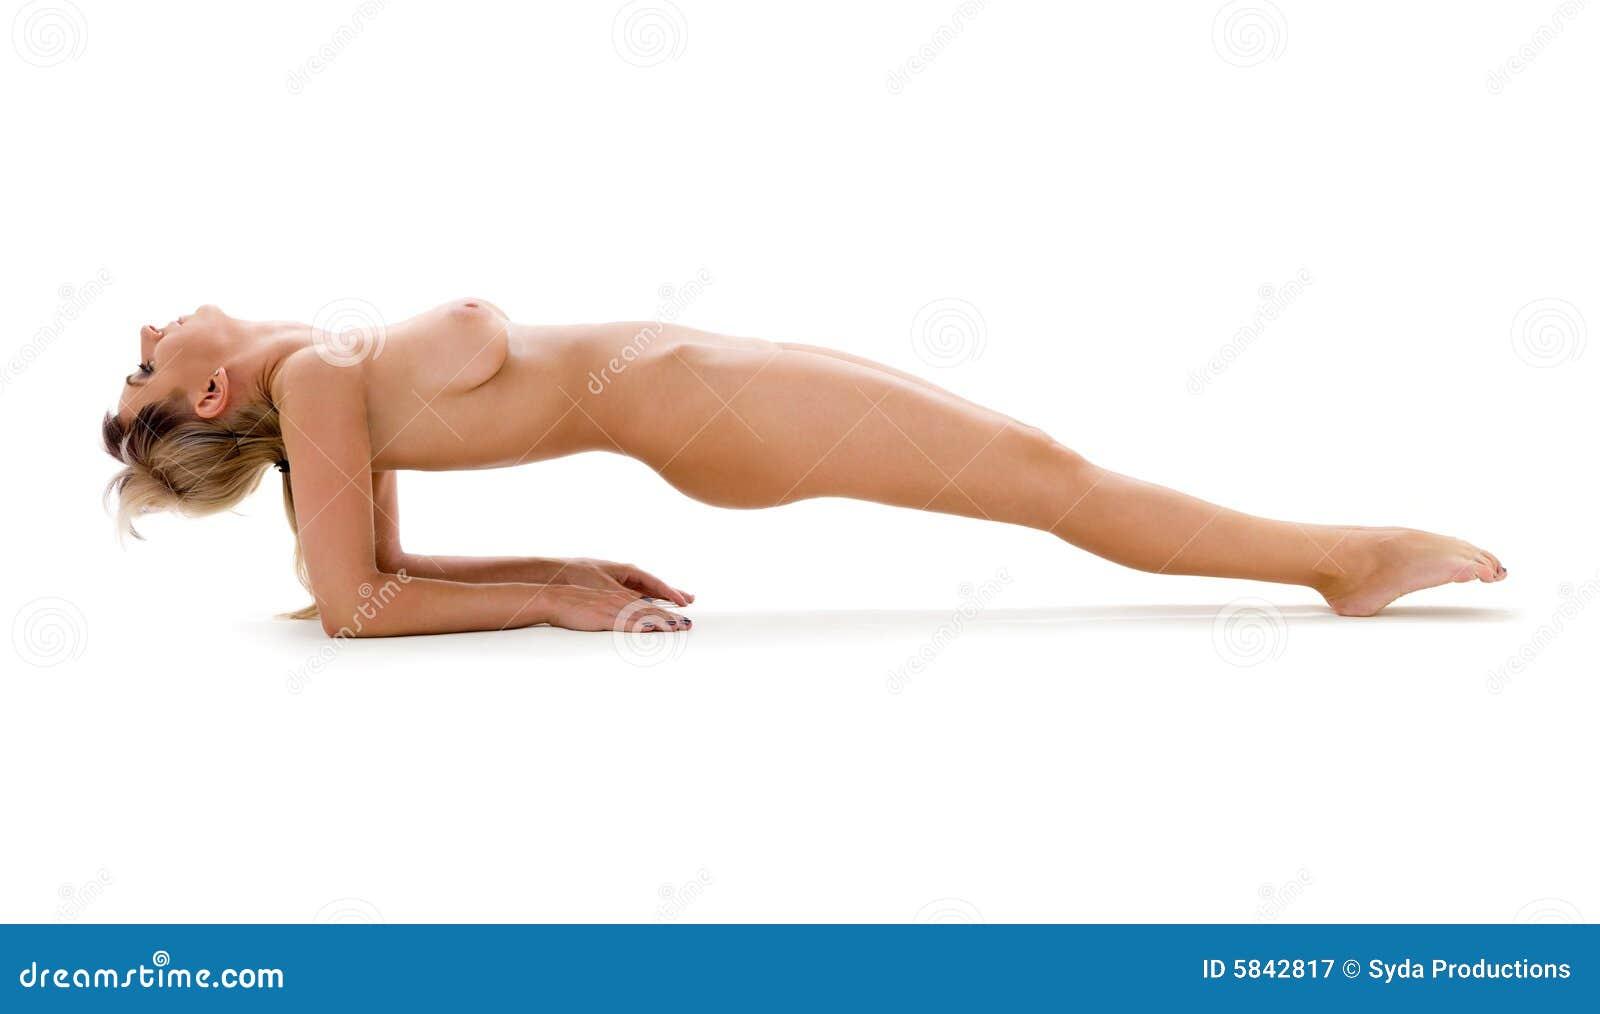 Nude yogy thumbs for free